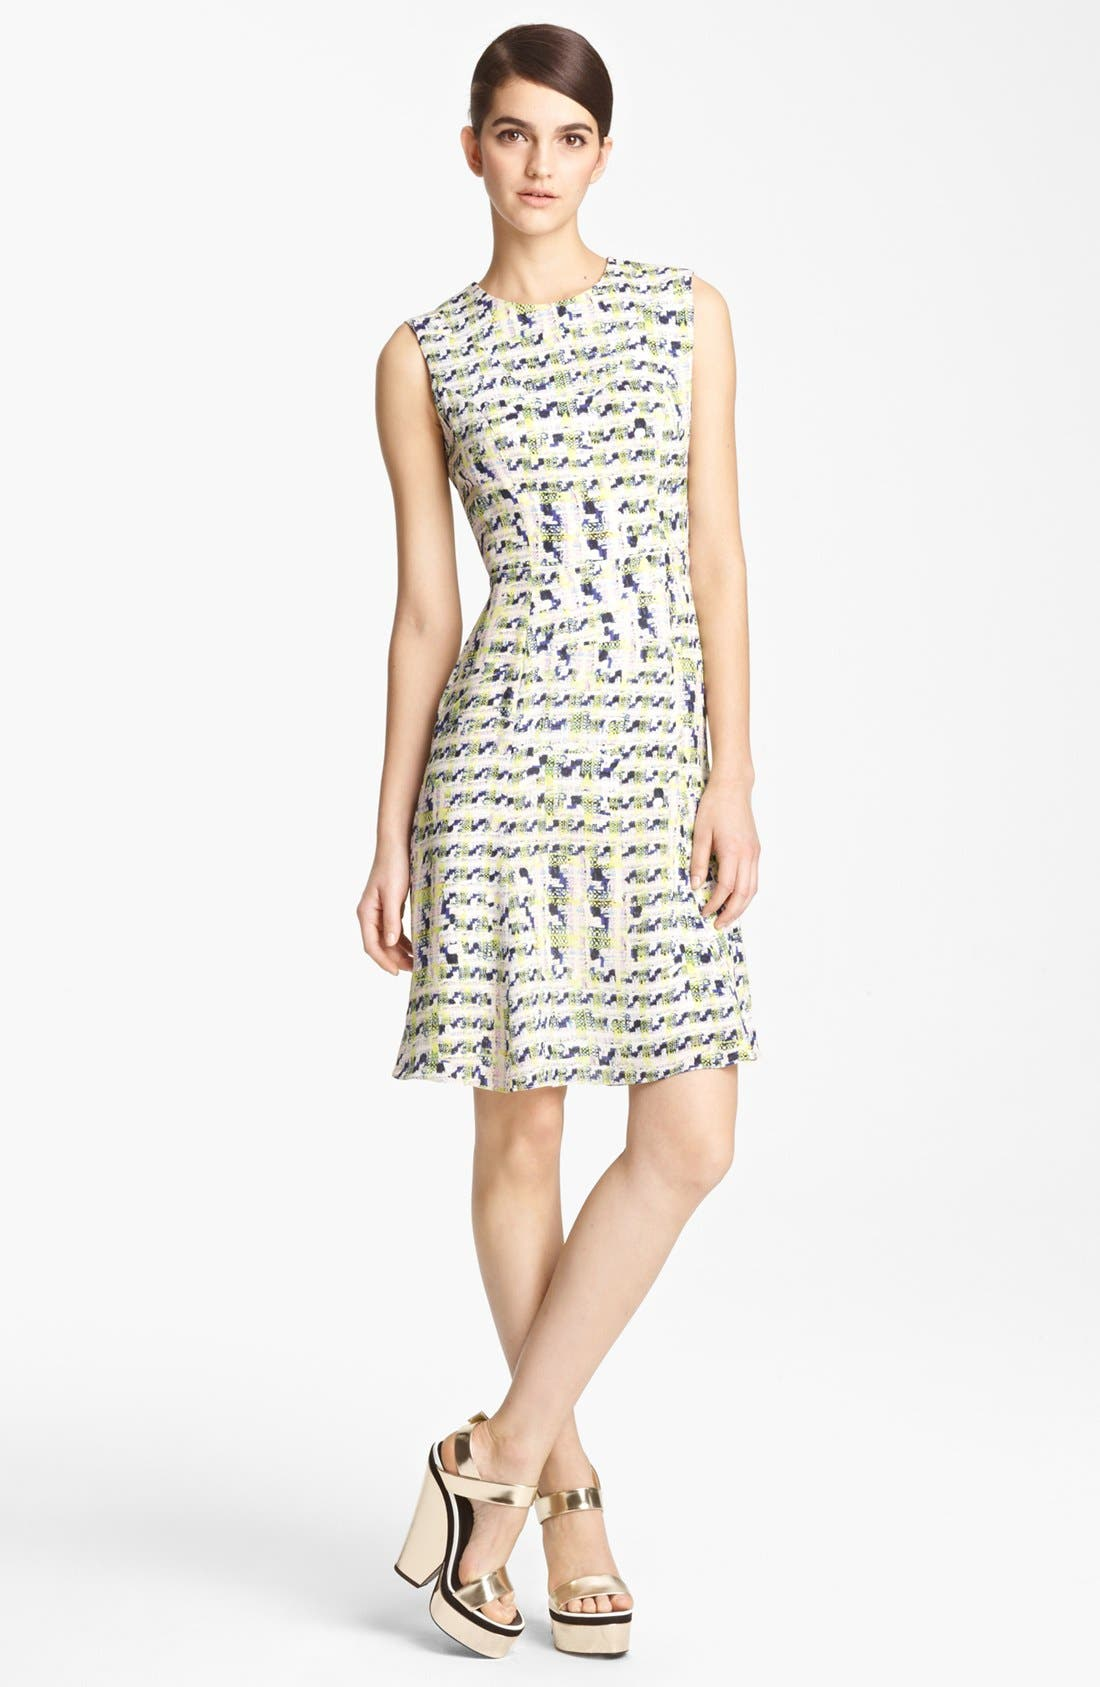 Main Image - Erdem Trompe l'Oeil Full Skirt Dress